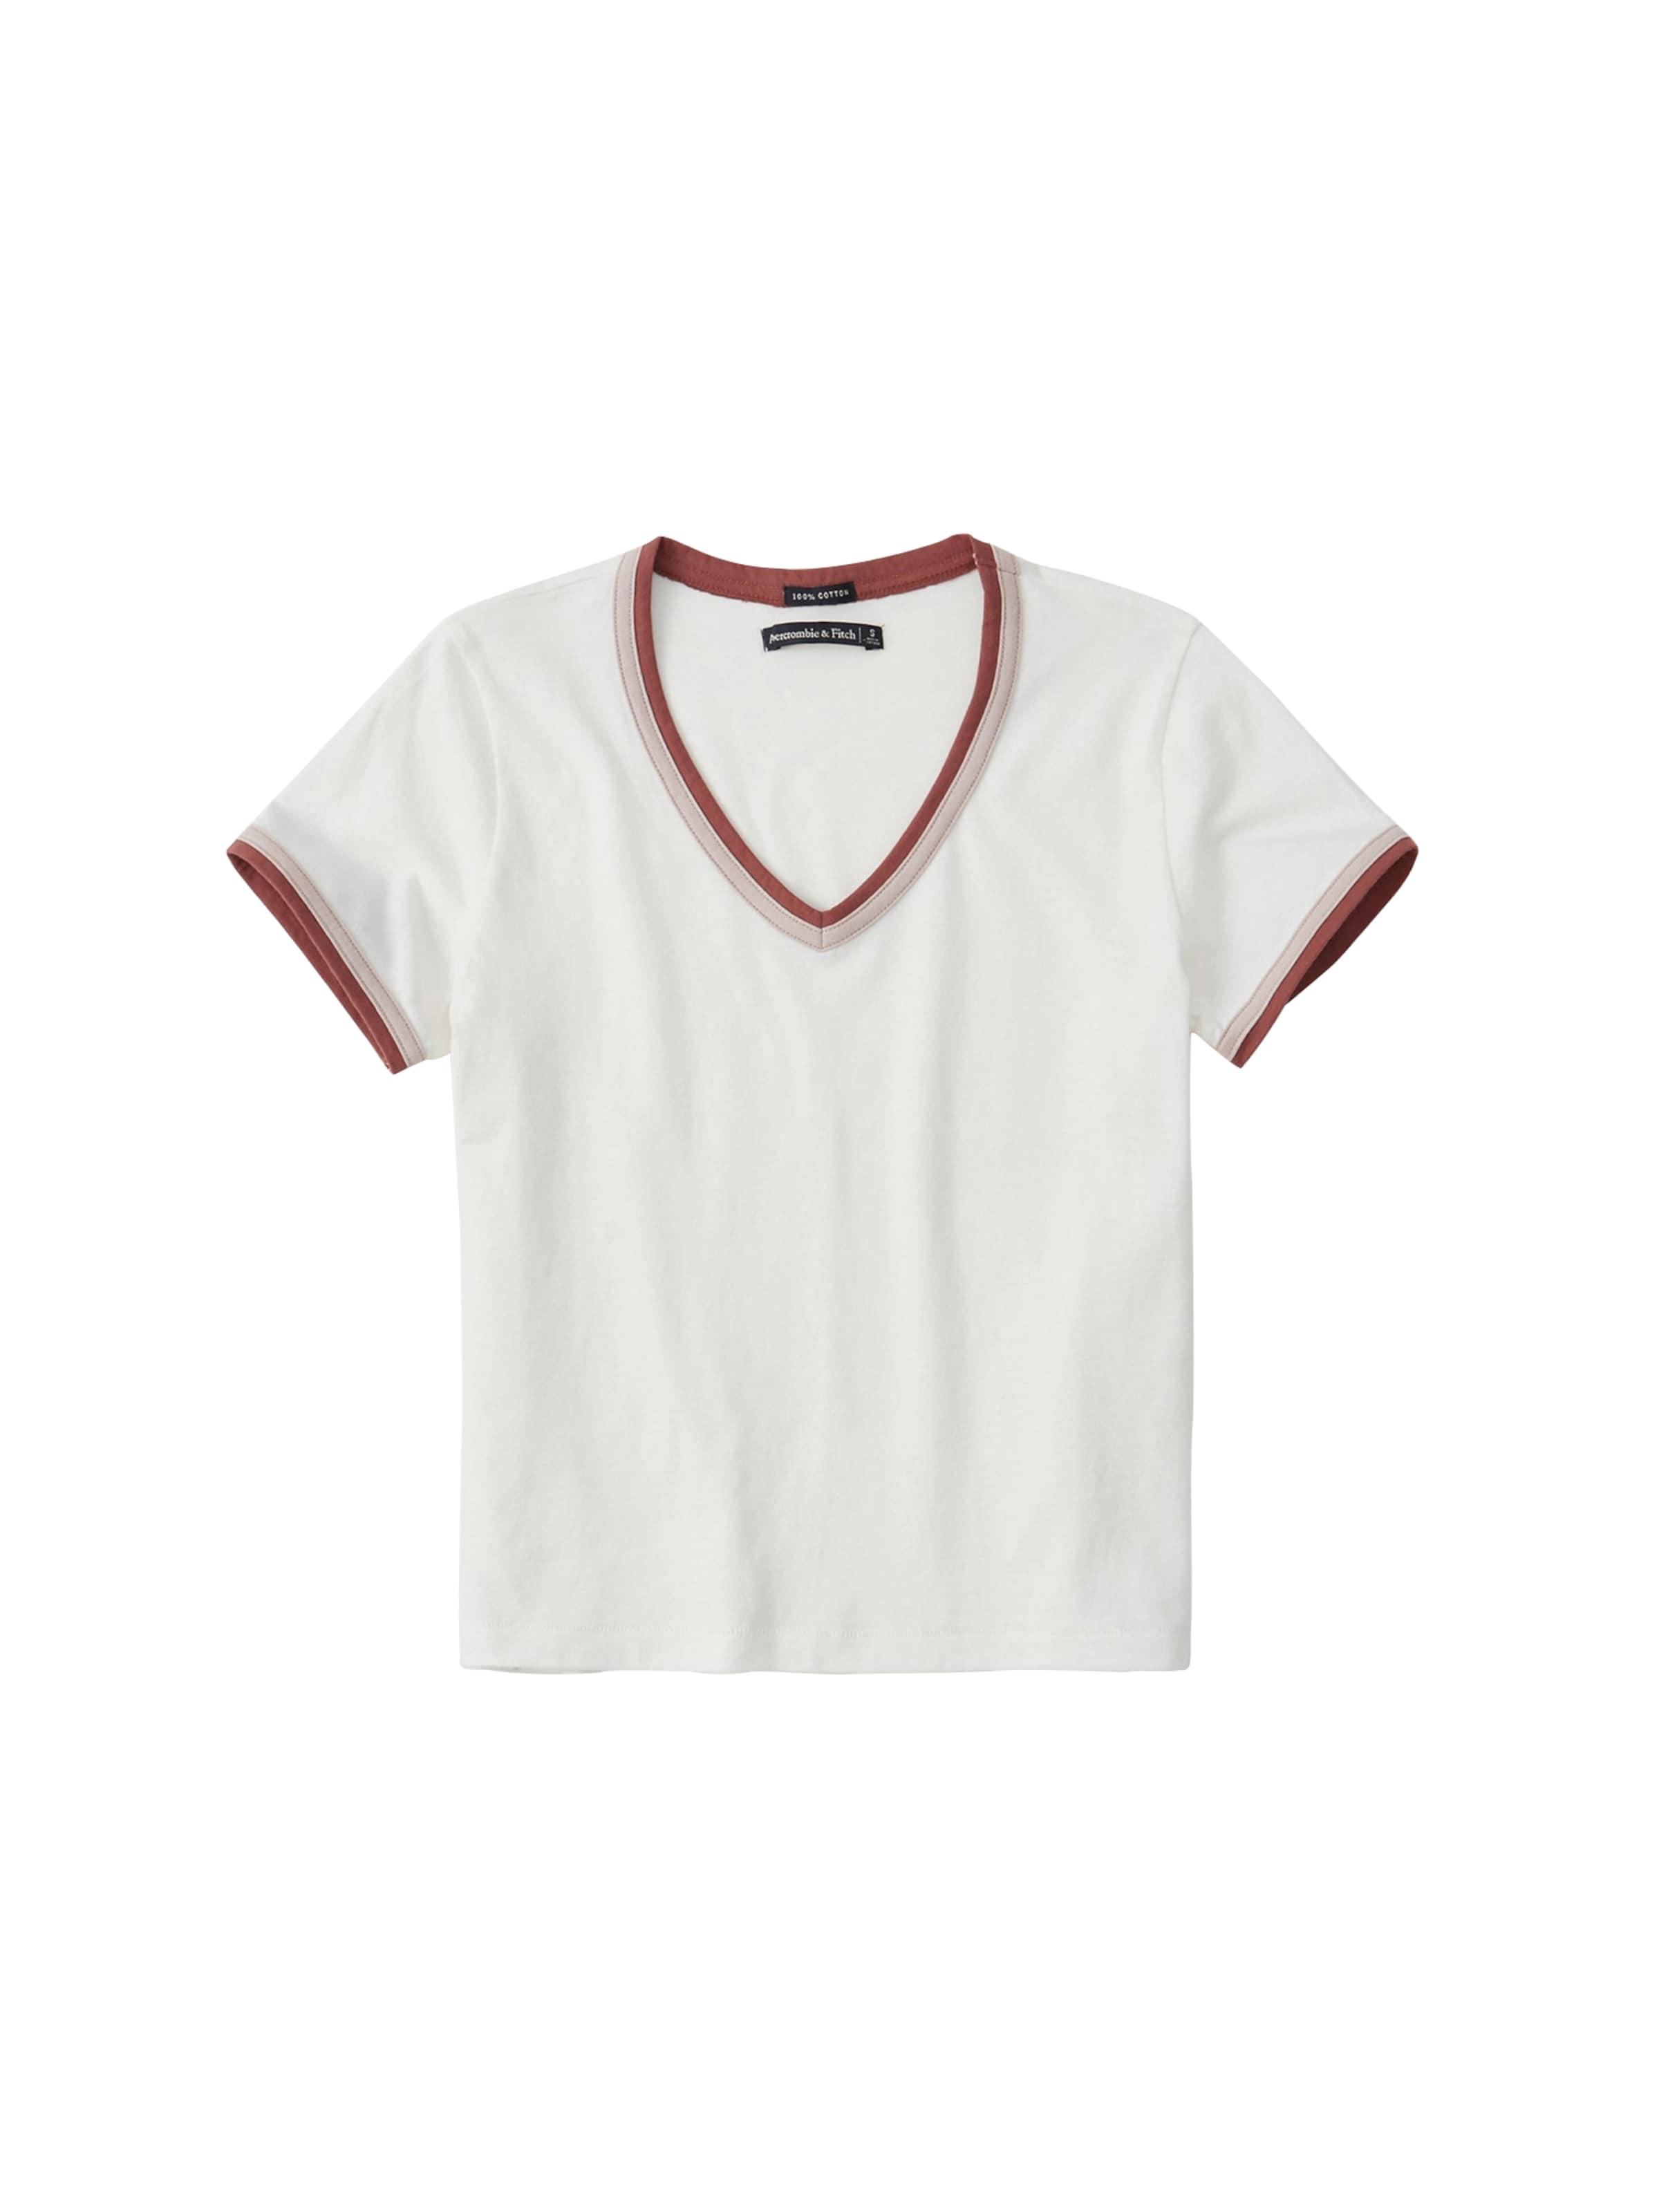 Tee' Fitch T En Abercrombieamp; Blanc 'sb19 ss Baby shirt shrdxBtCQ